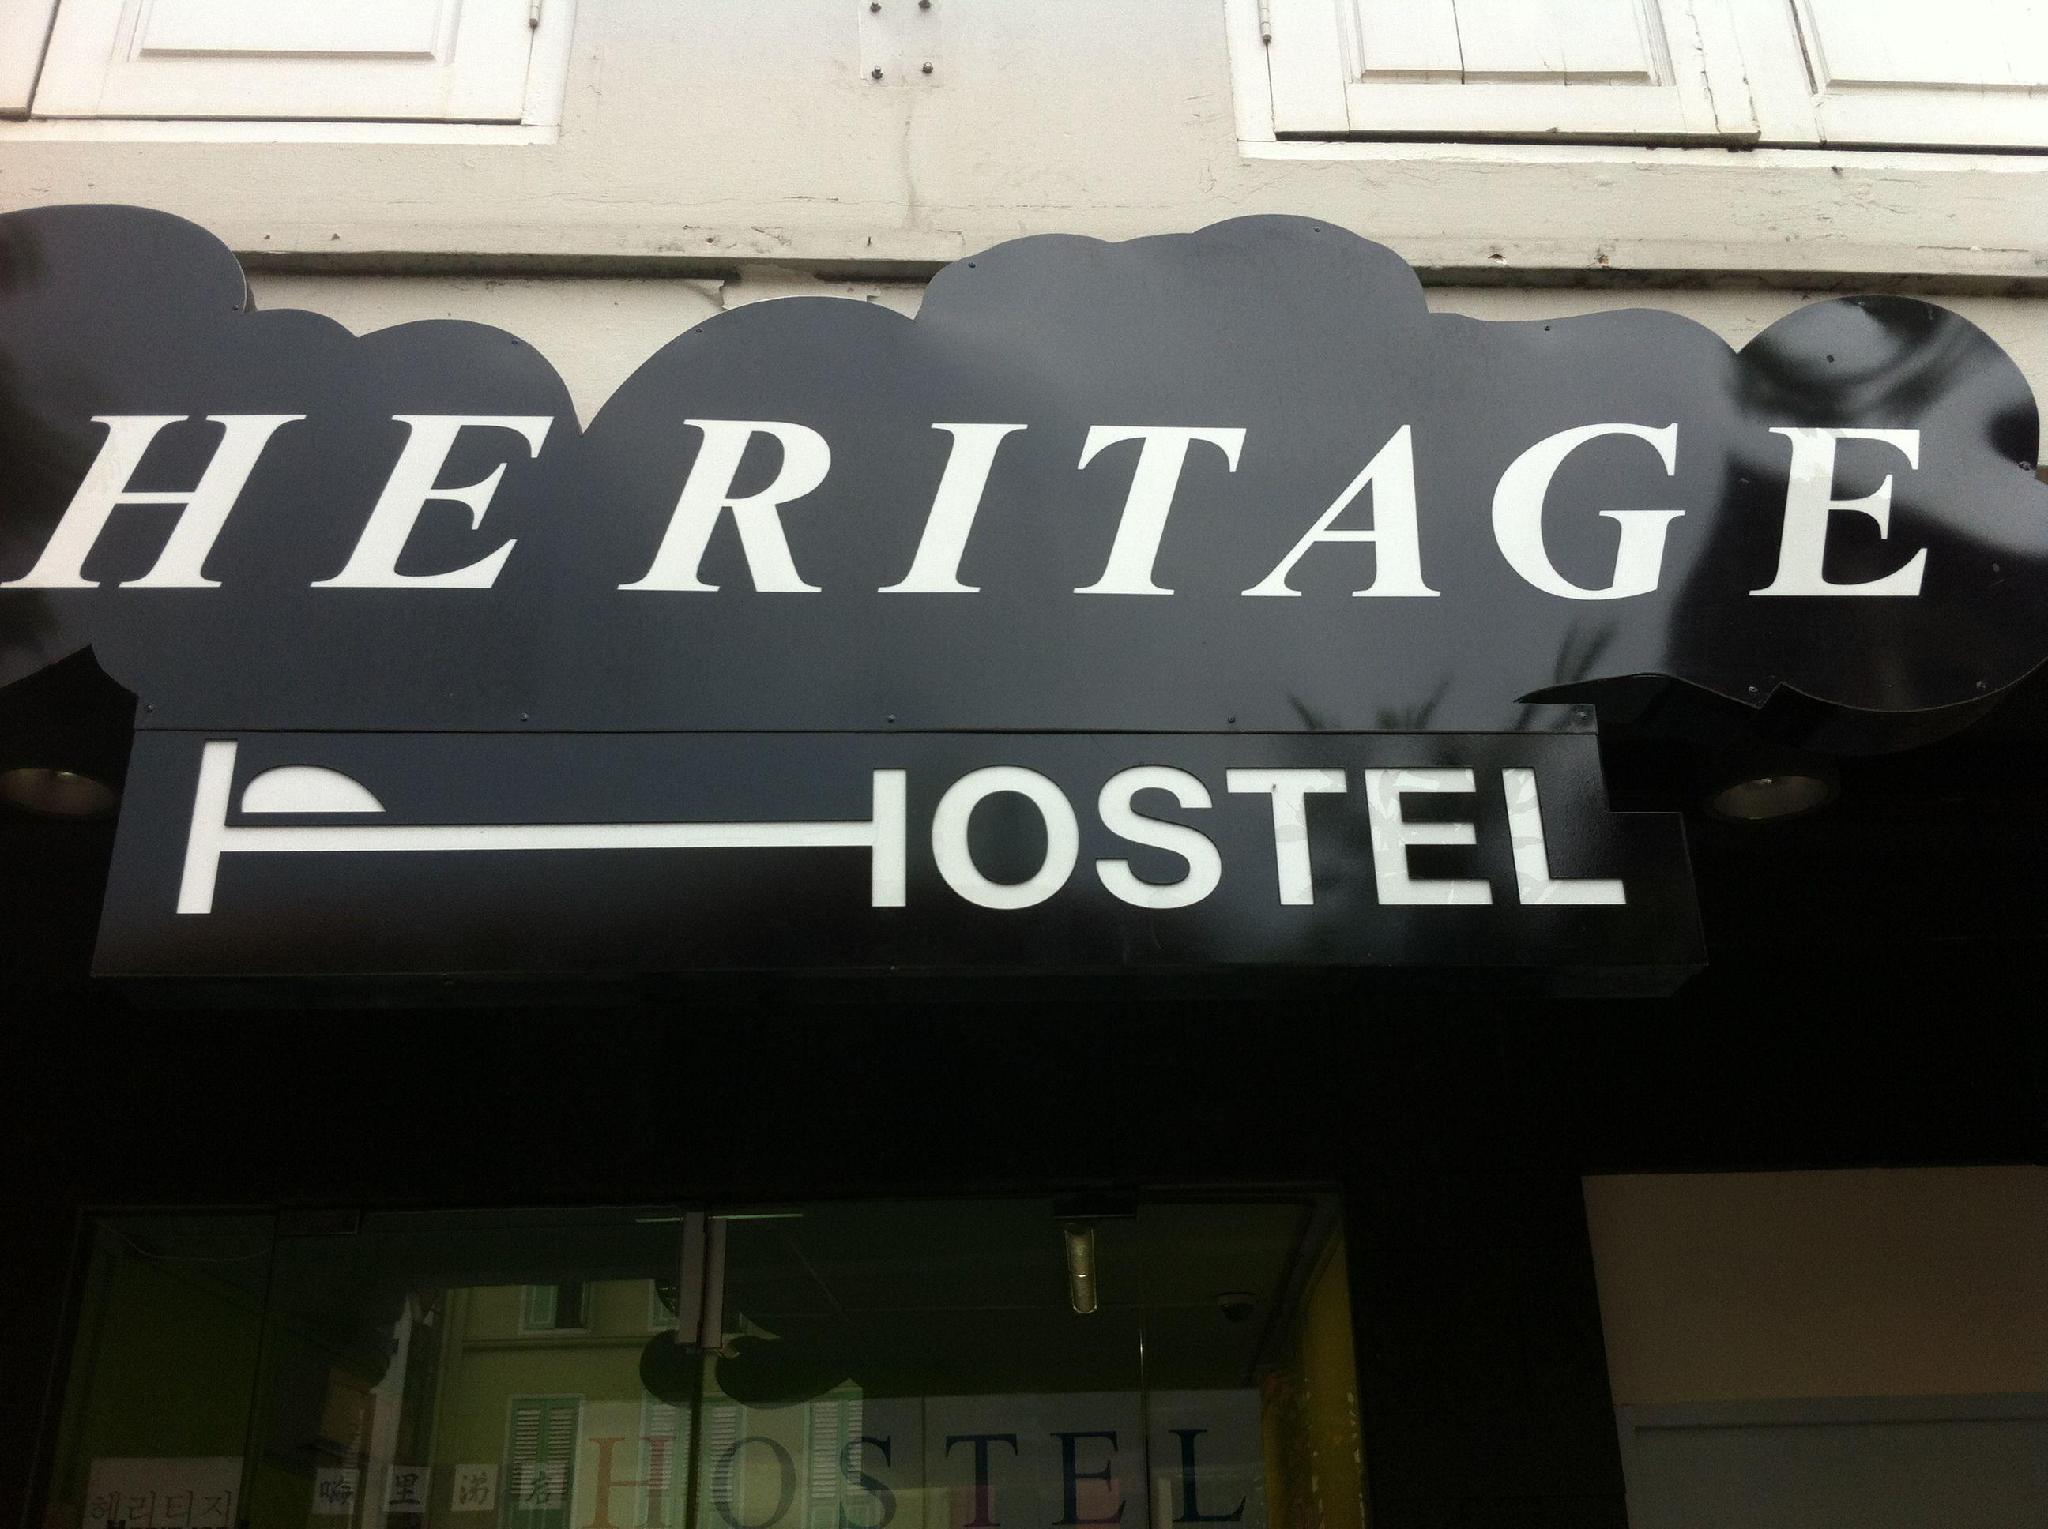 Heritage Hostel